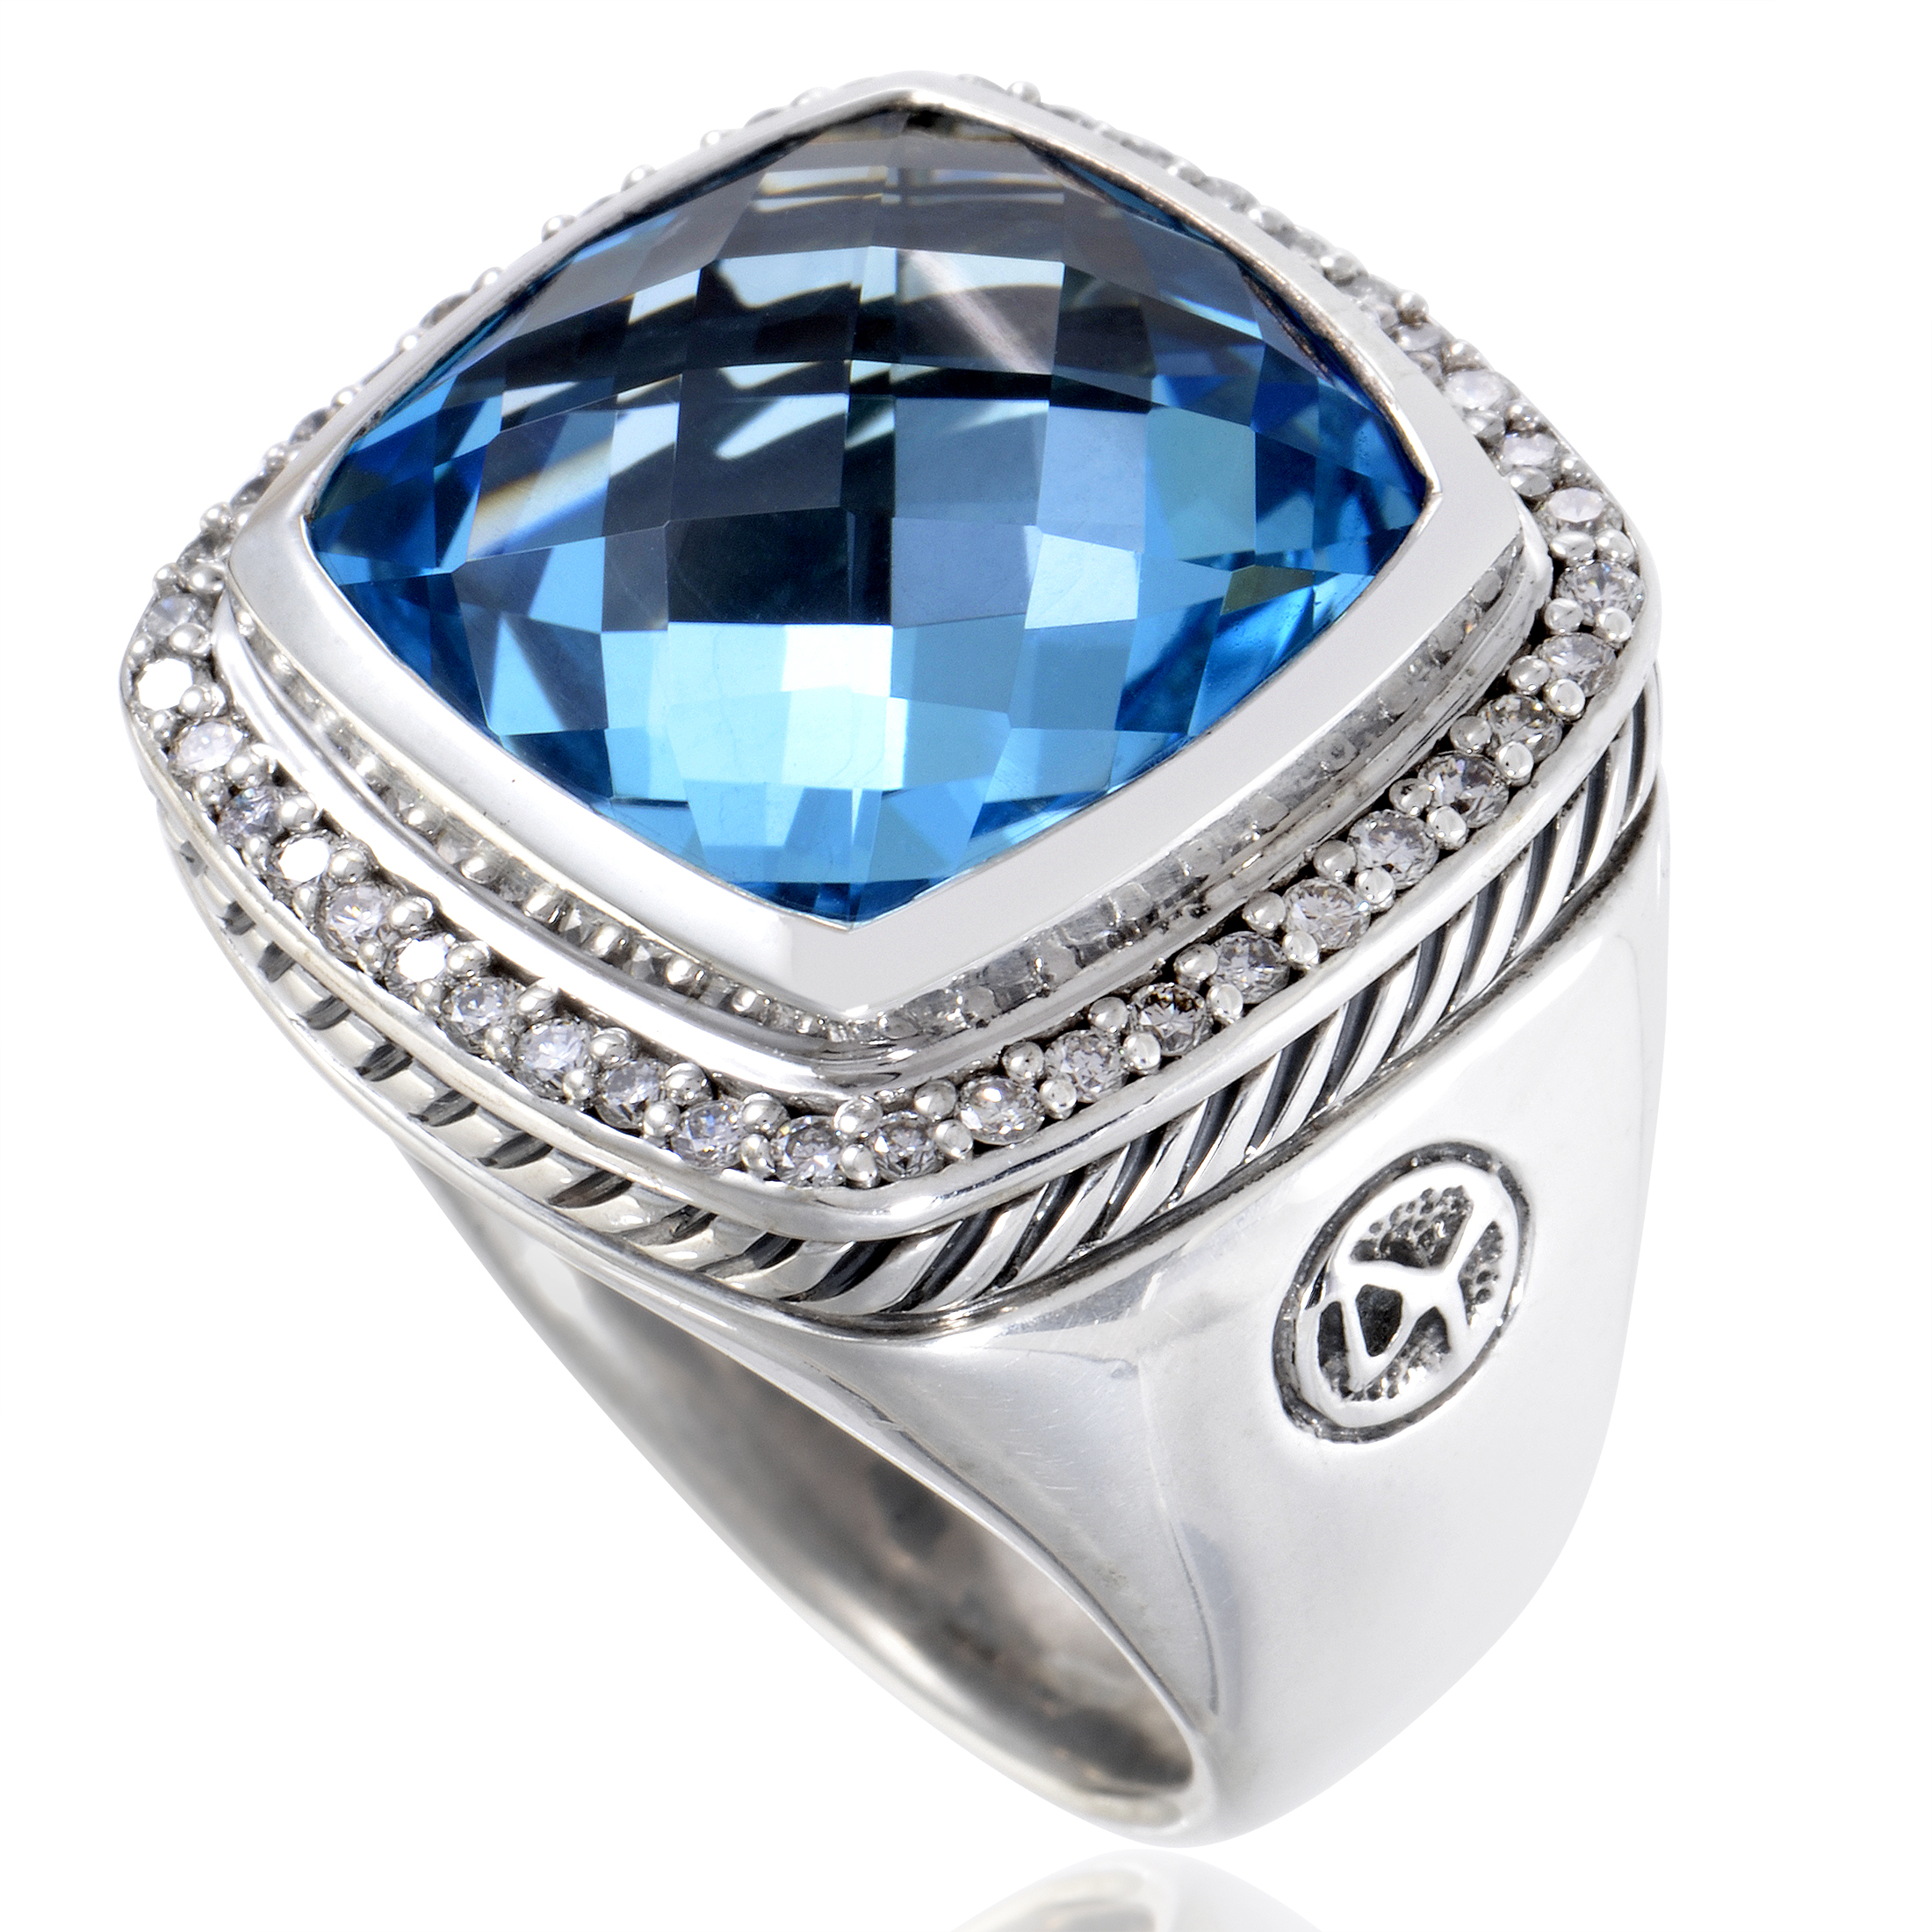 David Yurman Albion Women's Sterling Silver Diamond & Topaz Ring